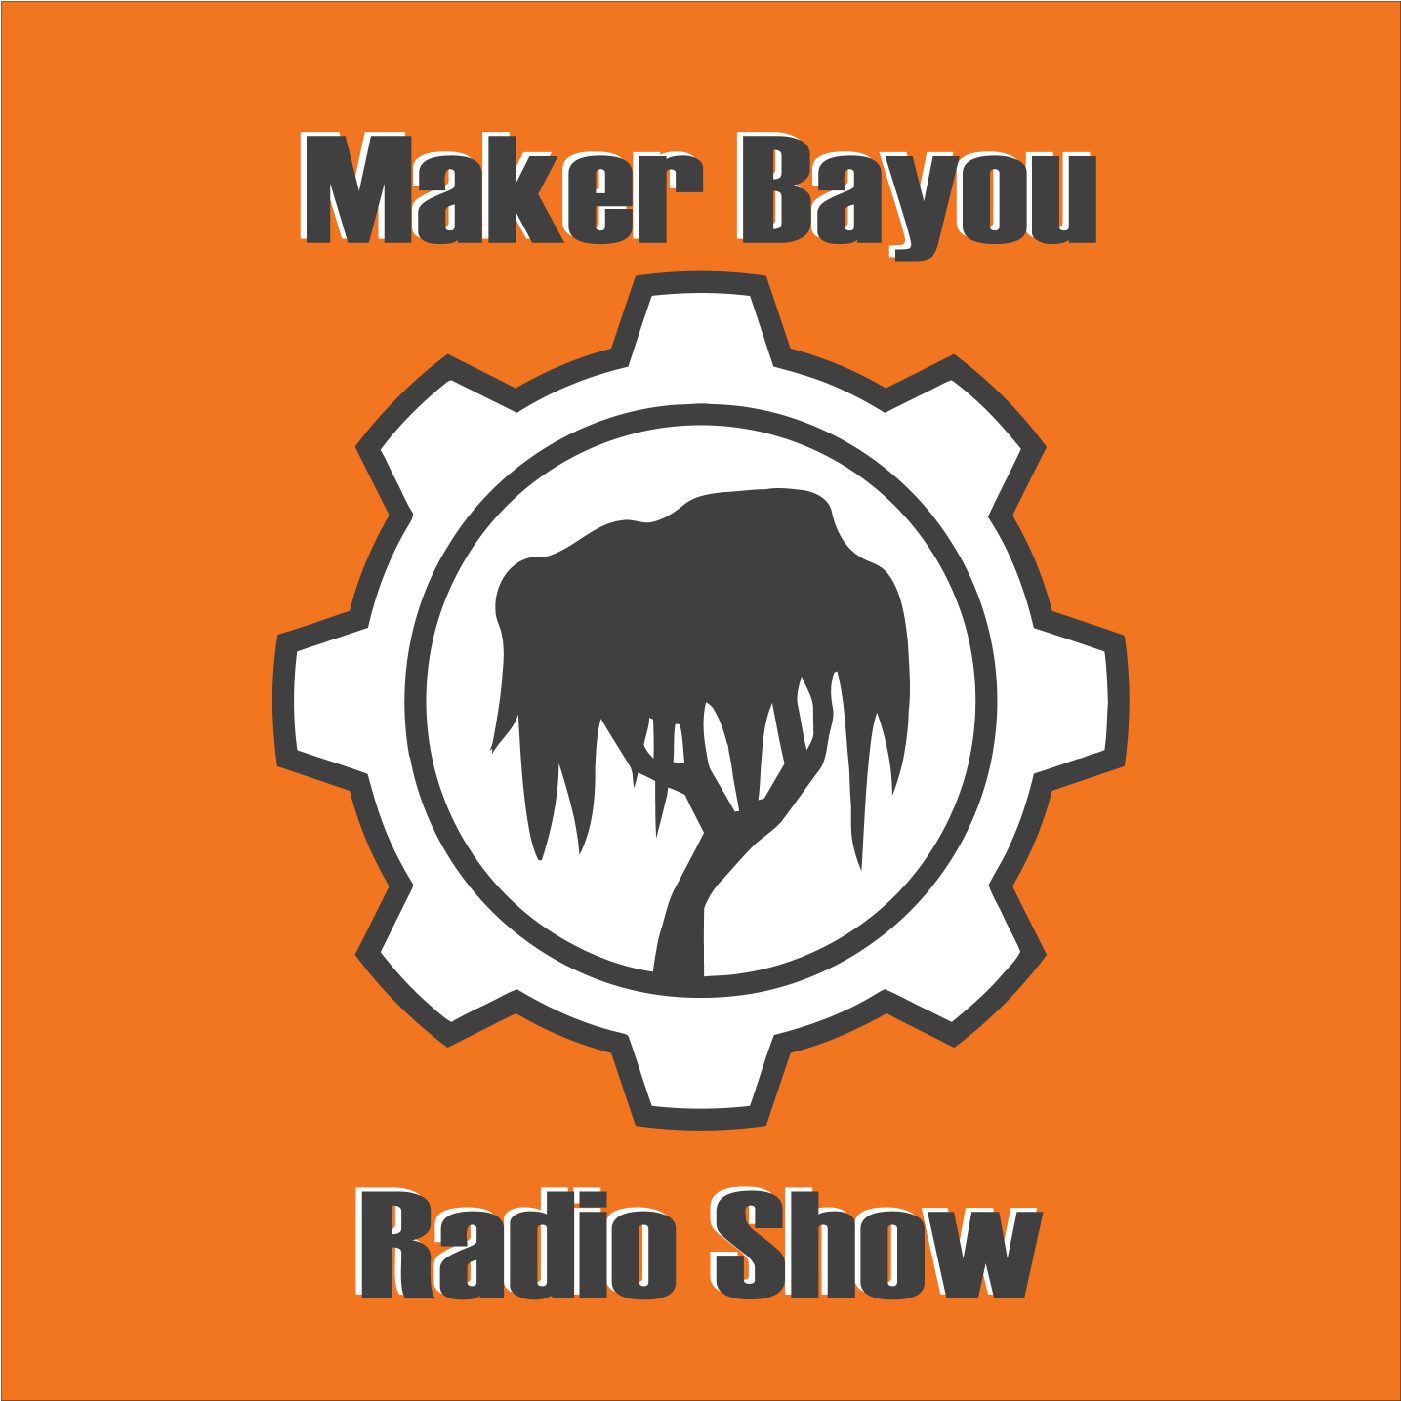 Maker Bayou Radio Show